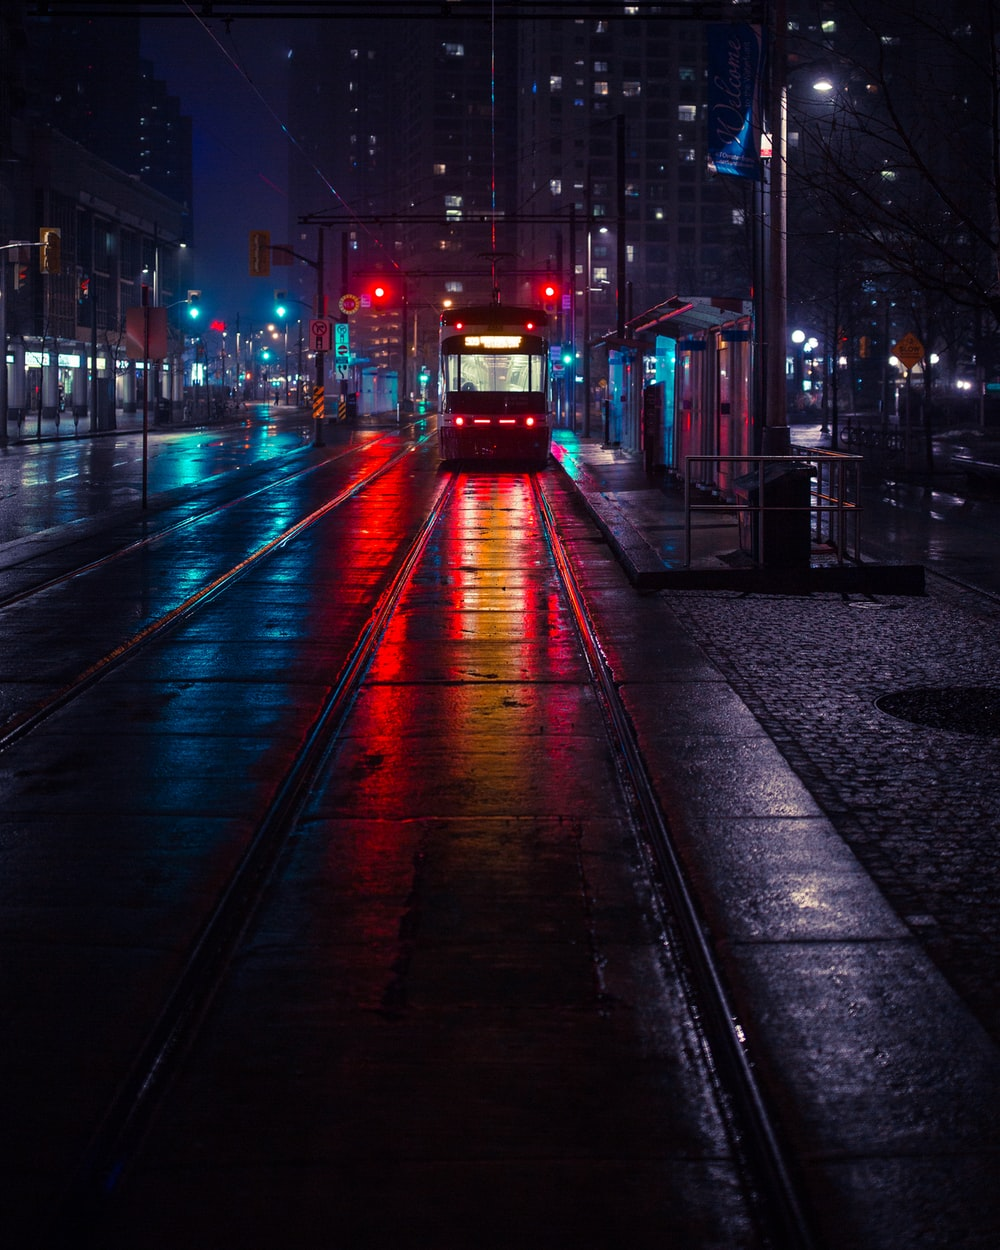 Photo Of Tram Beside Waiting Station During Nighttime Photo Free City Image On Unsplash